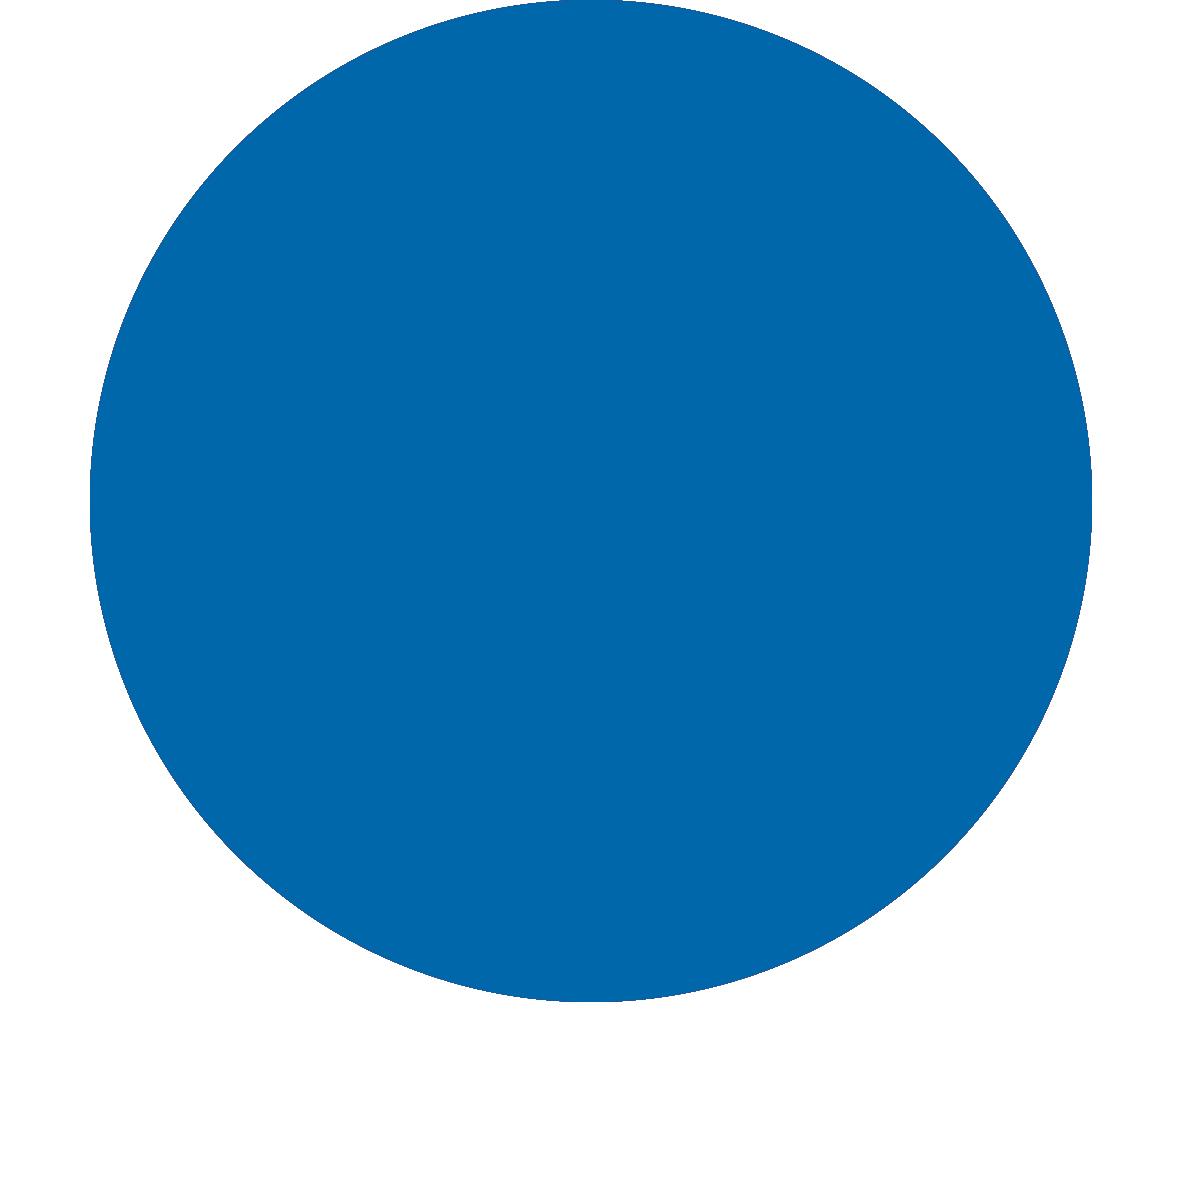 C.I. Blue 15.3(Blue 3G) -